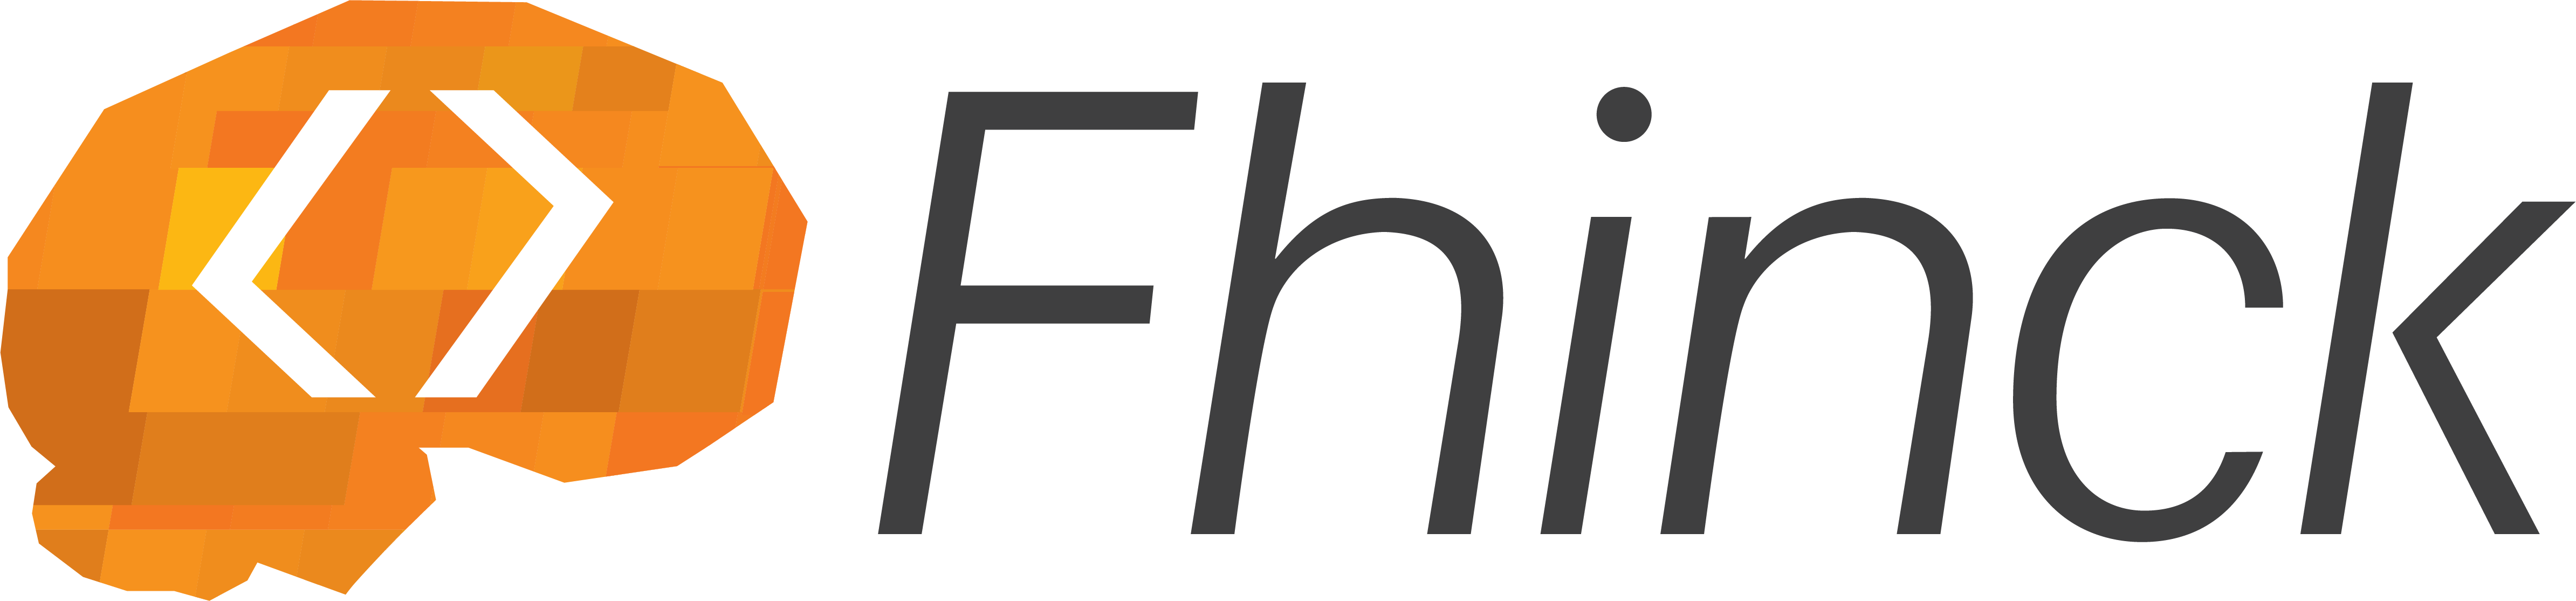 Fhinck